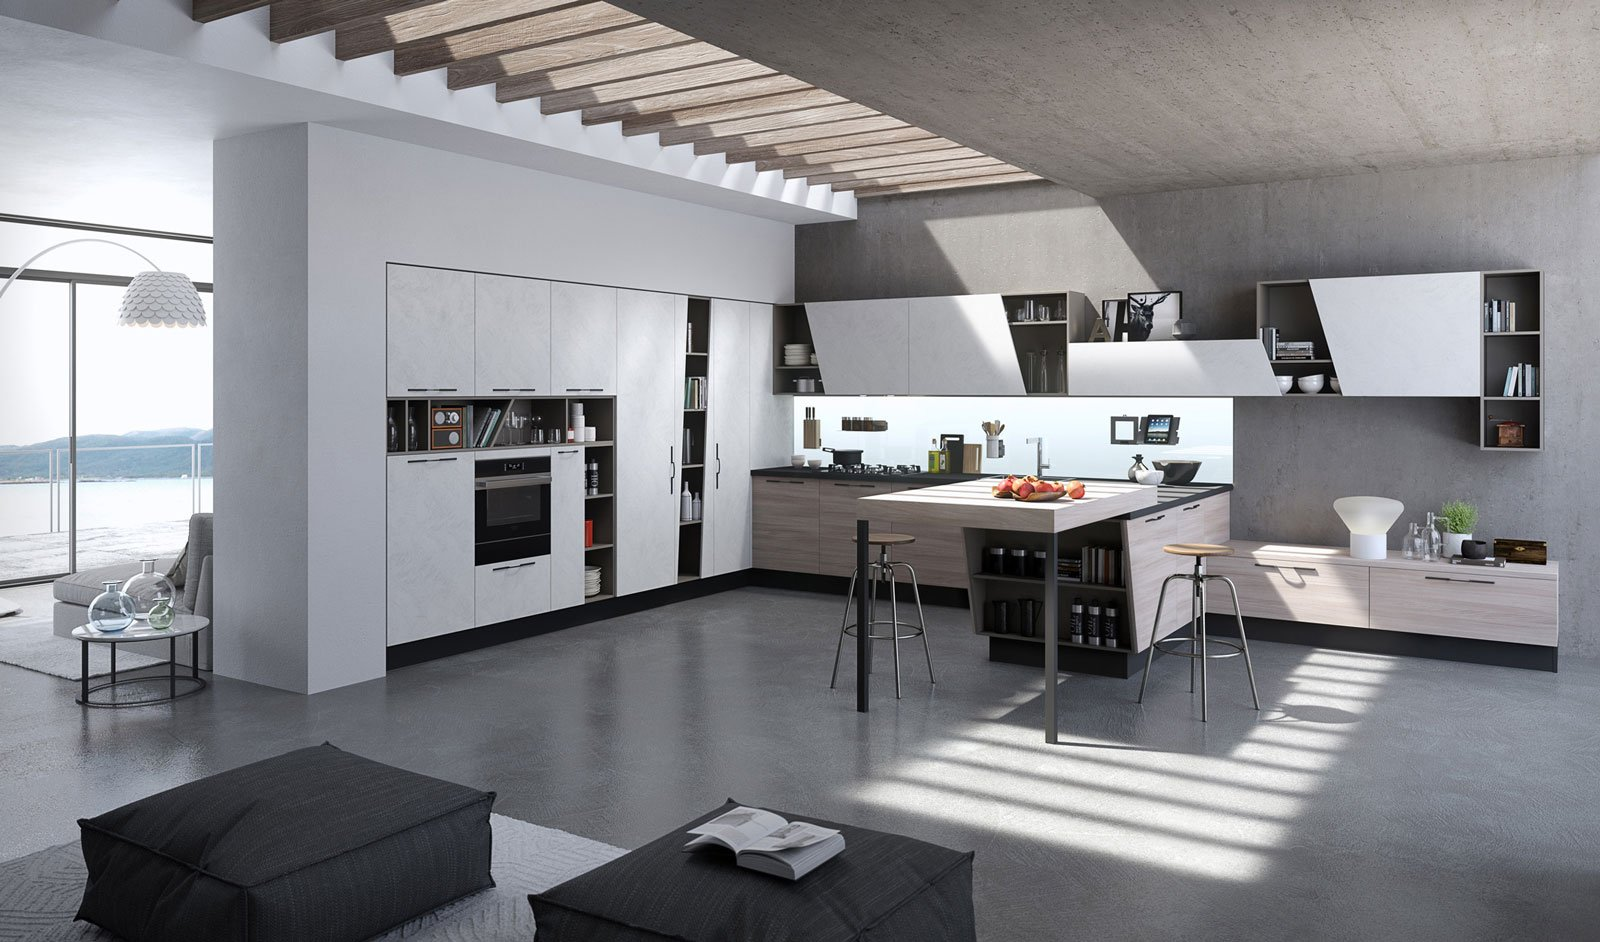 MagnetoLab in cucina, lo schienale in vetro magnetico | Elite ...